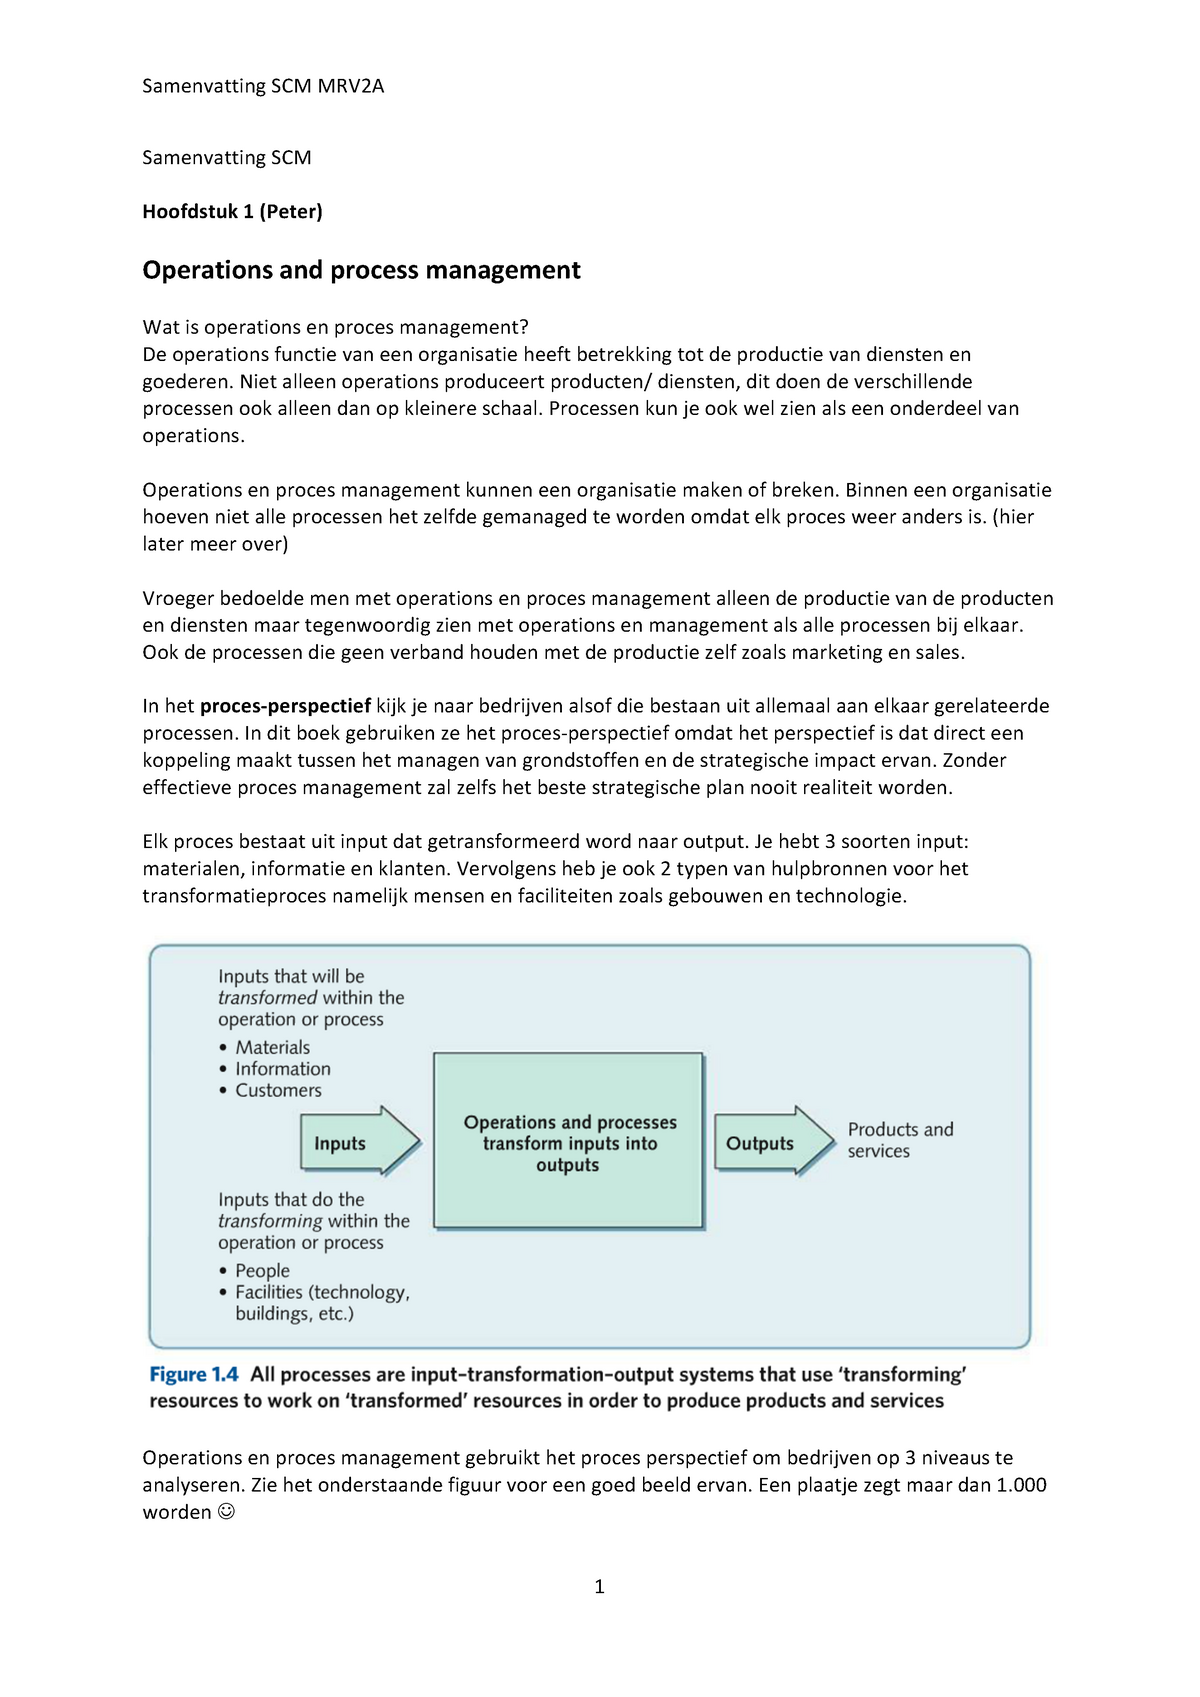 summary operations and process management principles and practicesummary operations and process management principles and practice for strategic impact 23 jul 2015 studocu